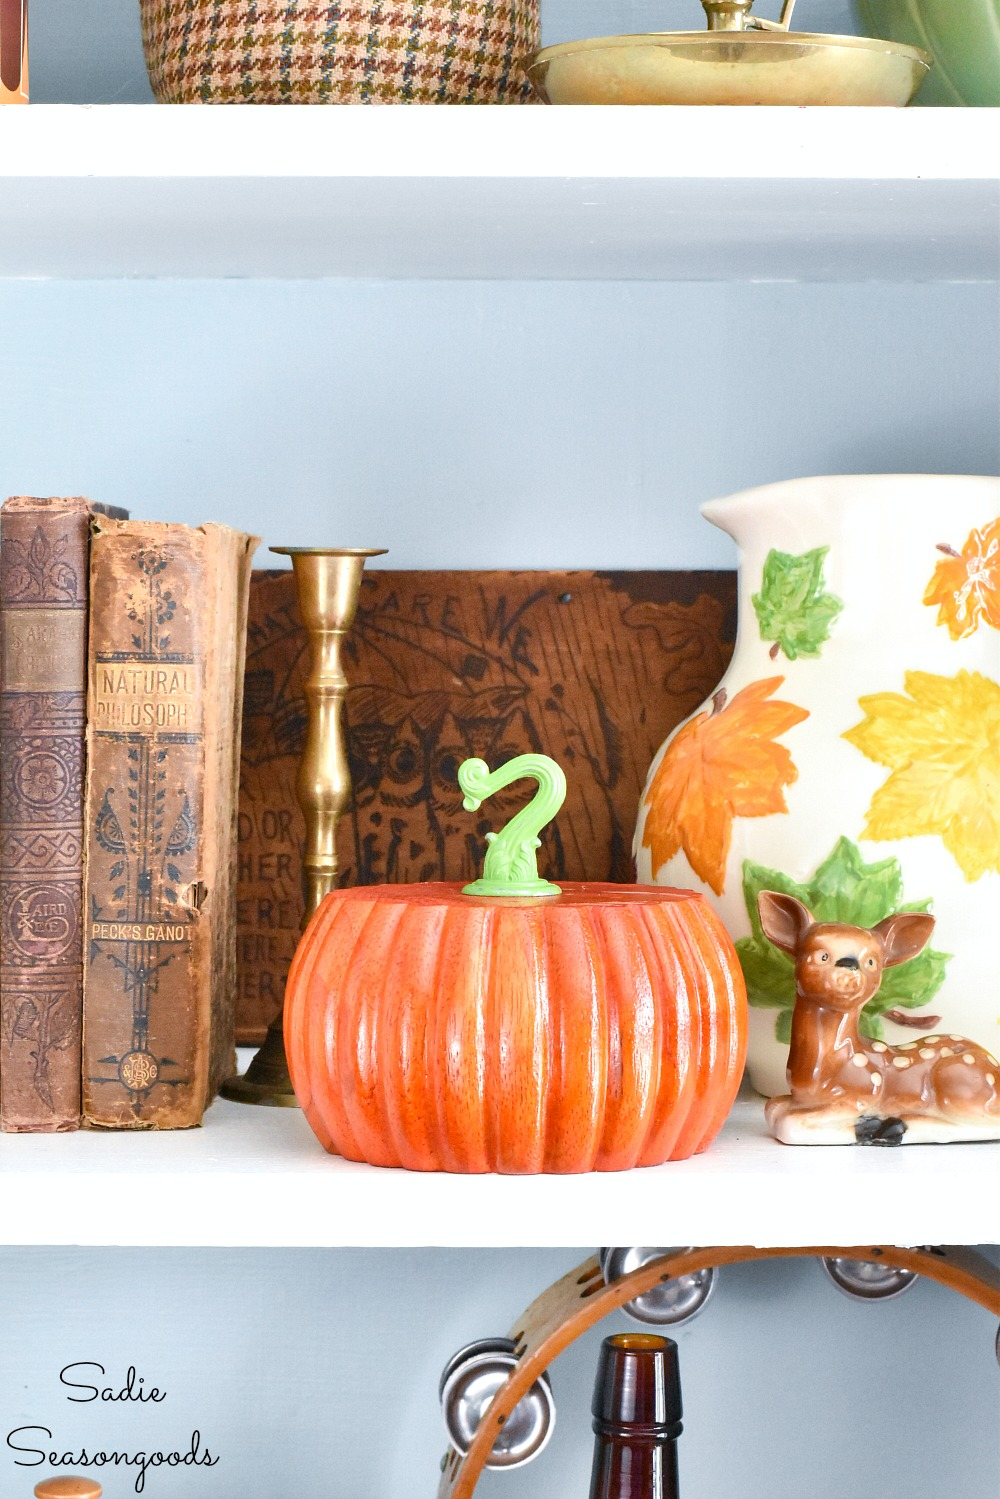 Decorating for autumn with bun feet as wood pumpkins